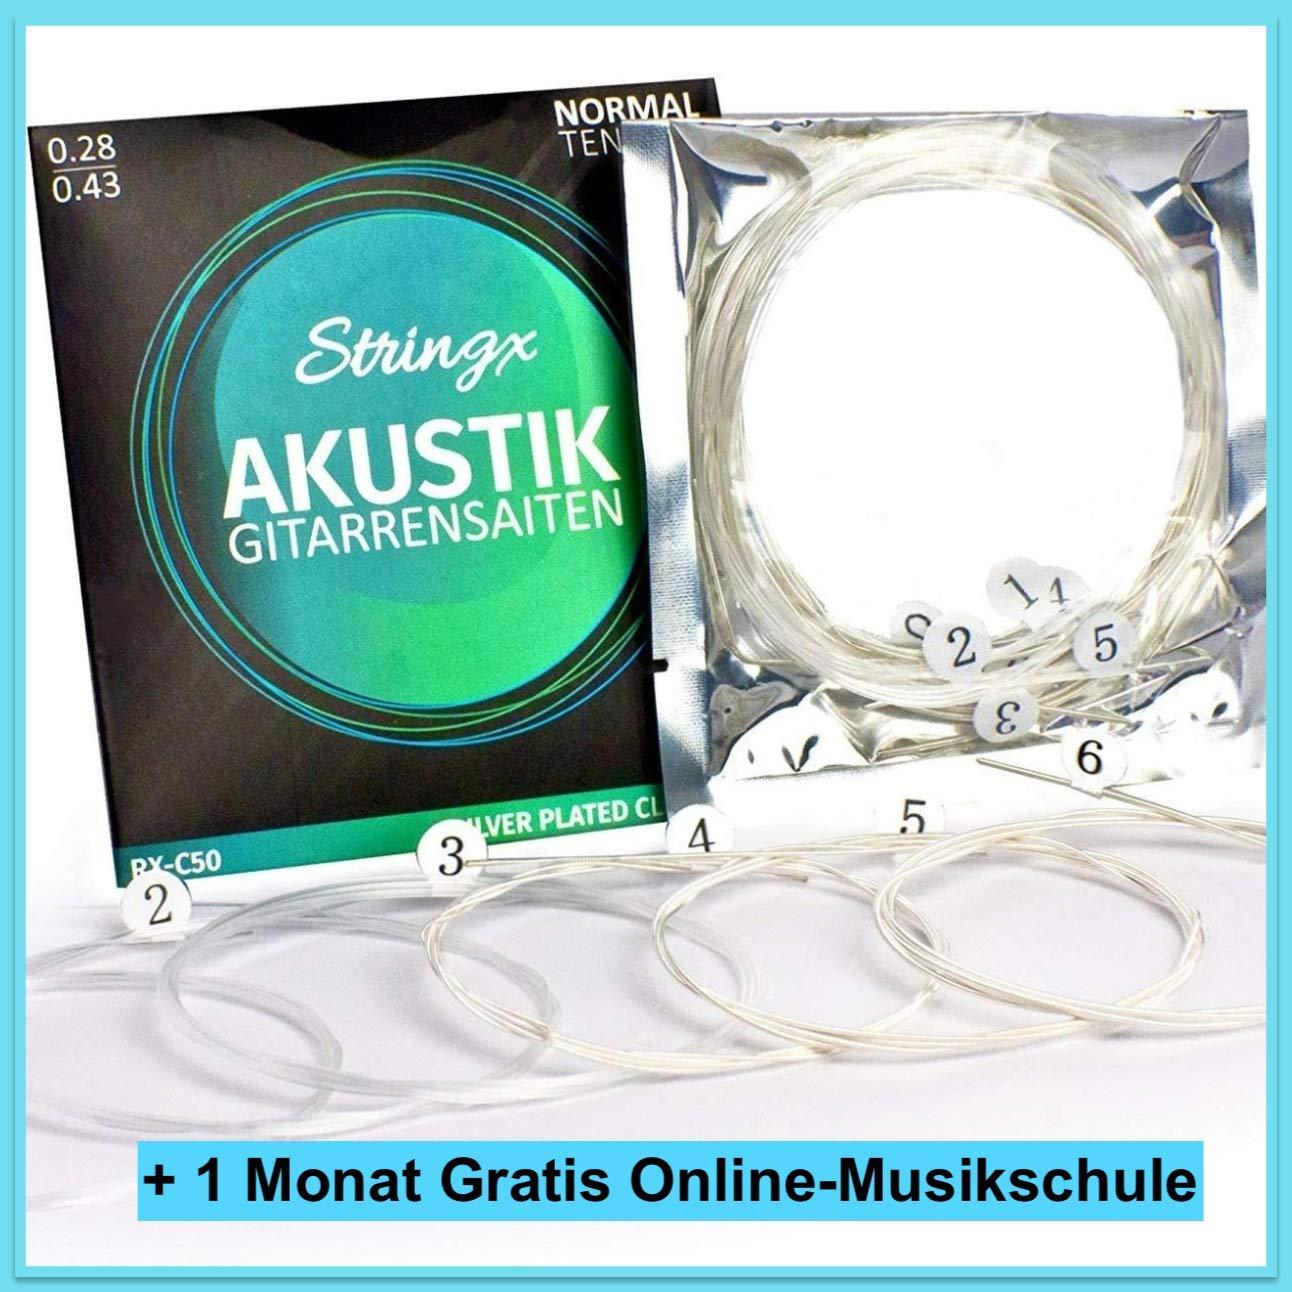 Cuerdas de nailon Stringx para guitarra acústica - Muy resistente ...